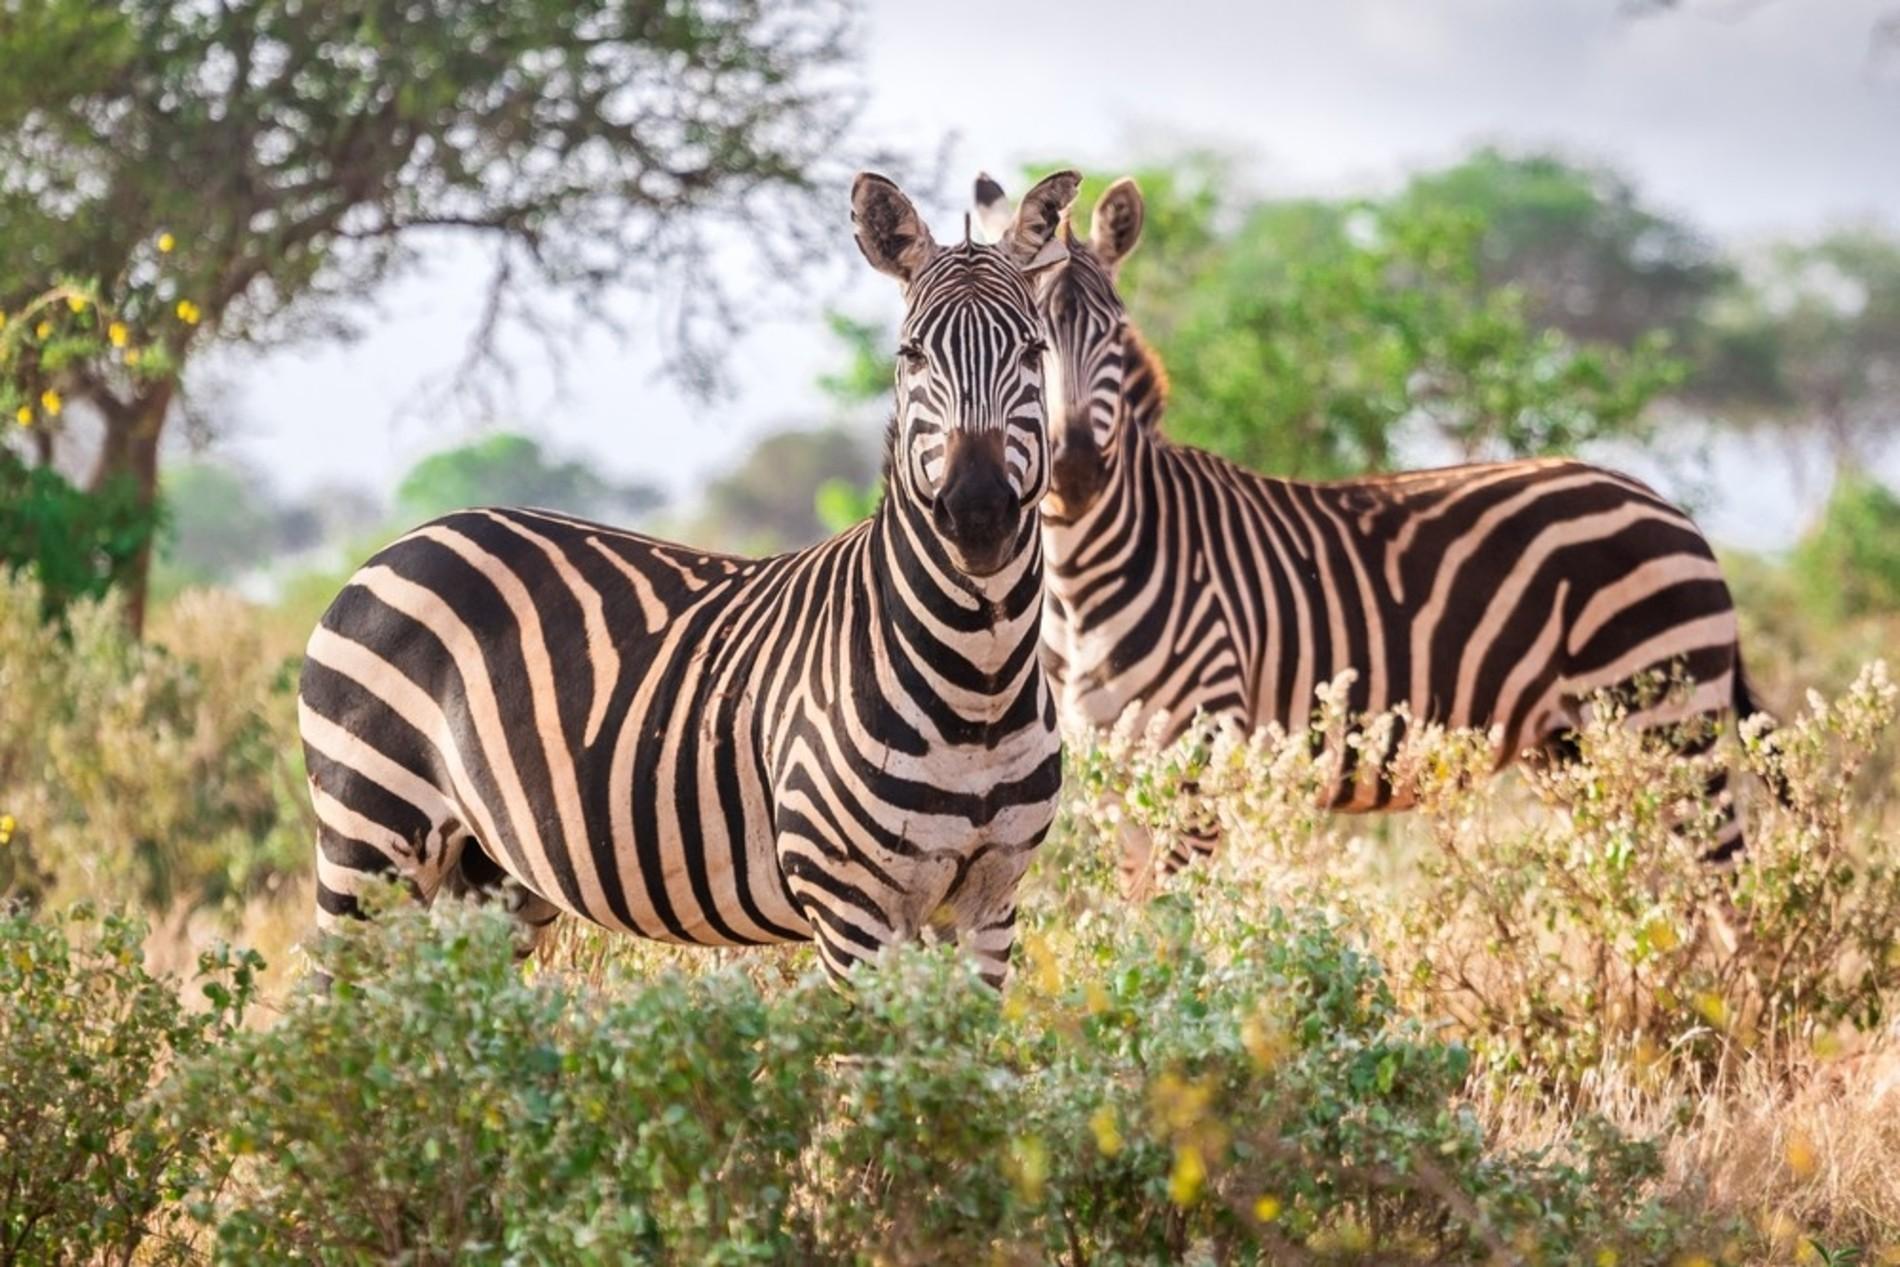 Zebra in Tsavo West National Park, Kenya